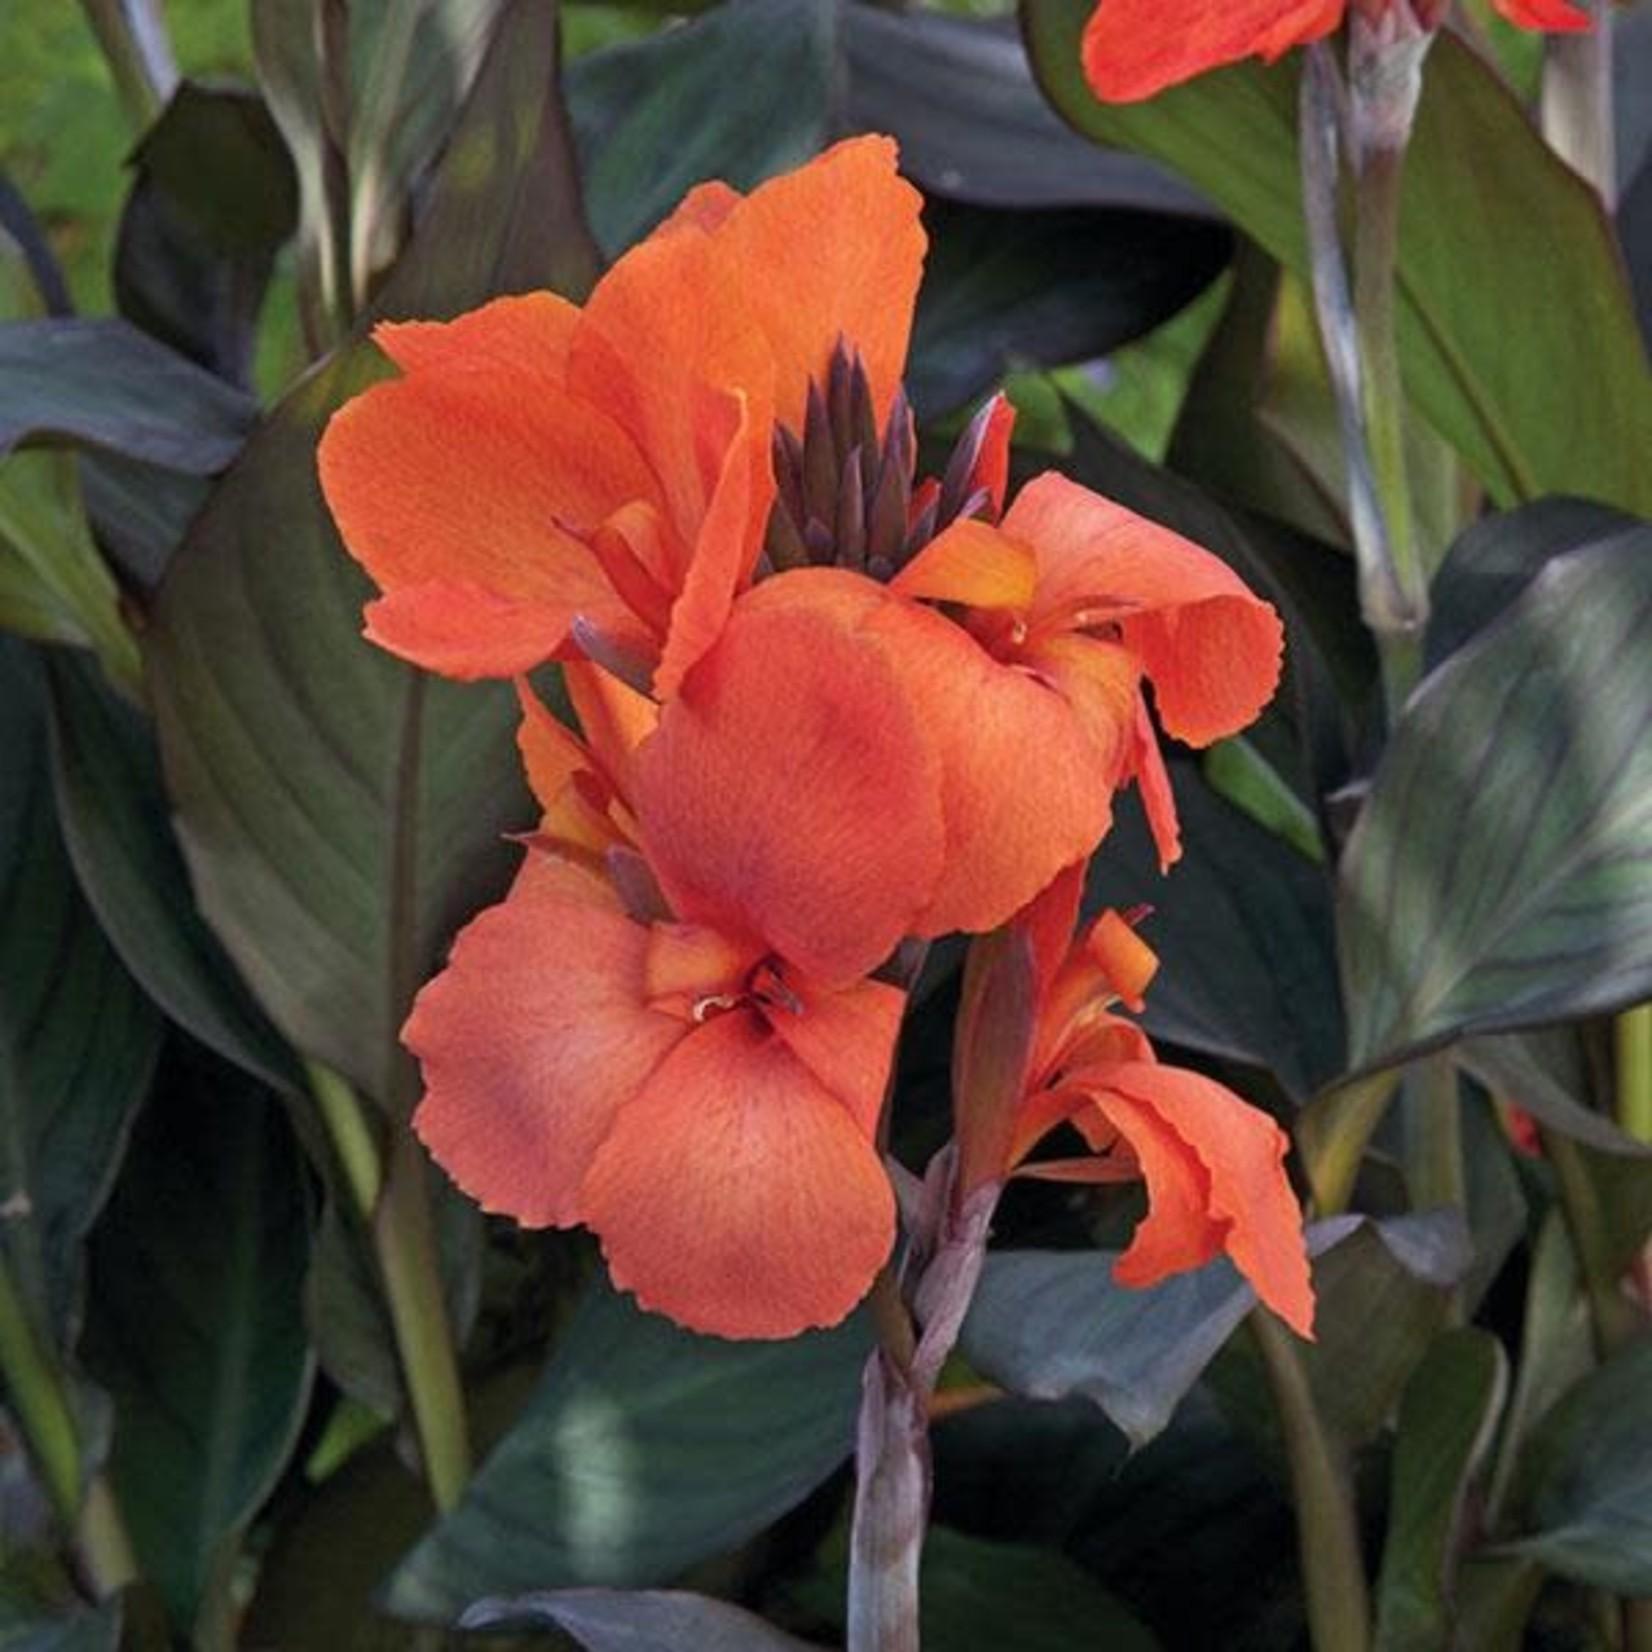 Canna Lily 'orange' 1 gal